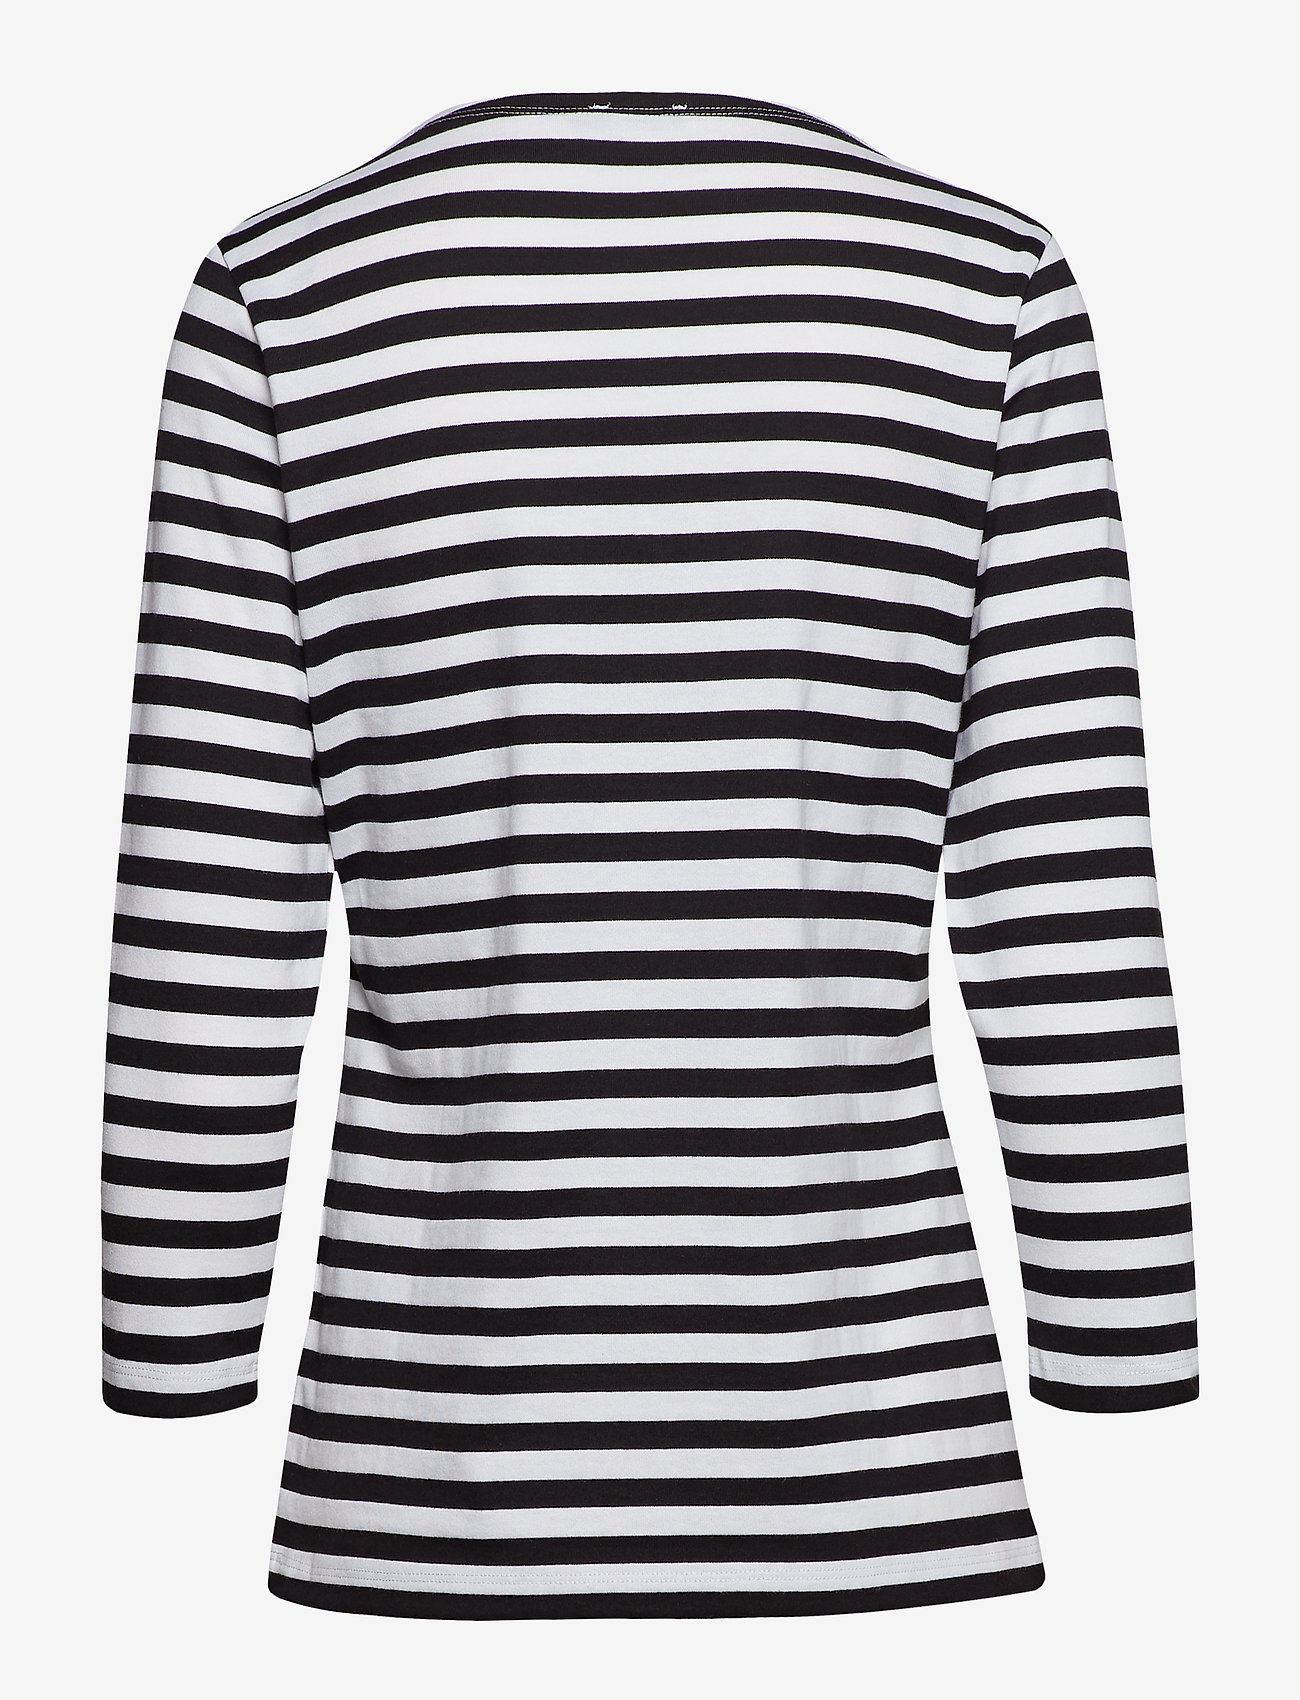 Marimekko - Ilma shirt - langærmede toppe - white, black - 1